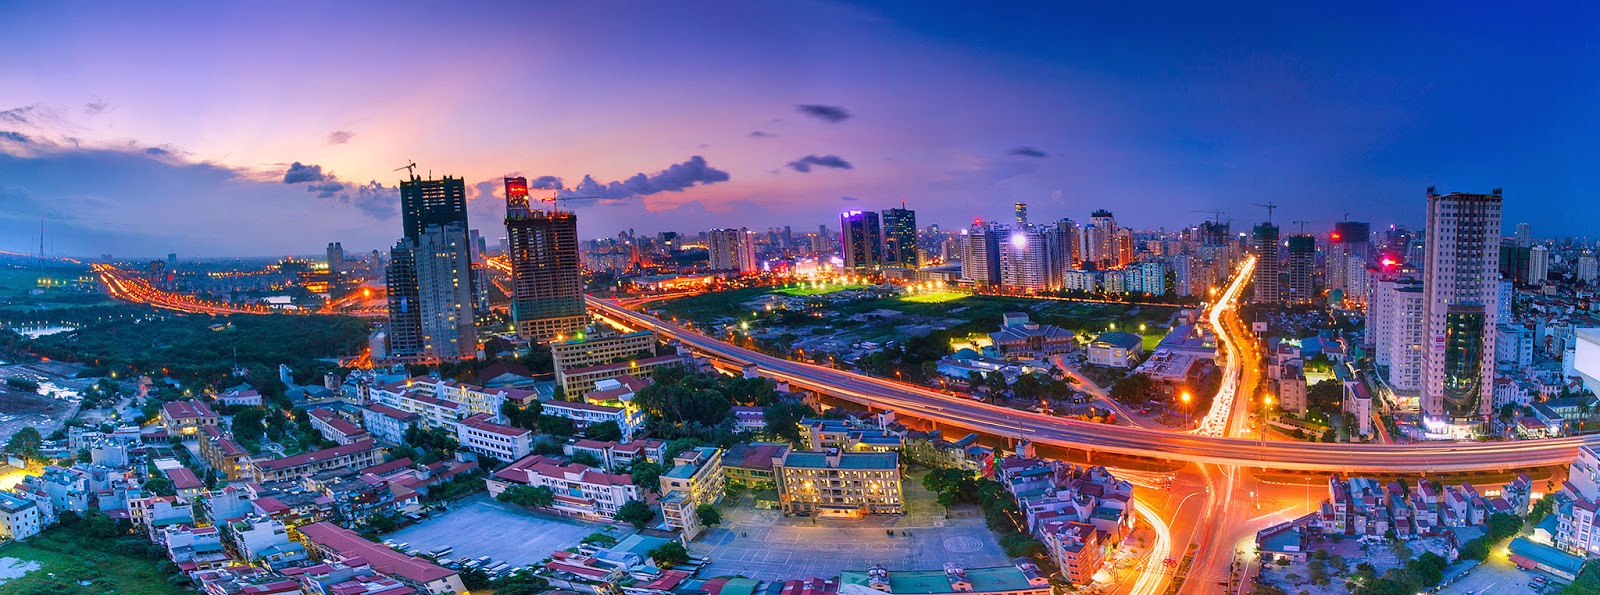 Hanoi – the antique & dynamic capital of Vietnam | Vietnam